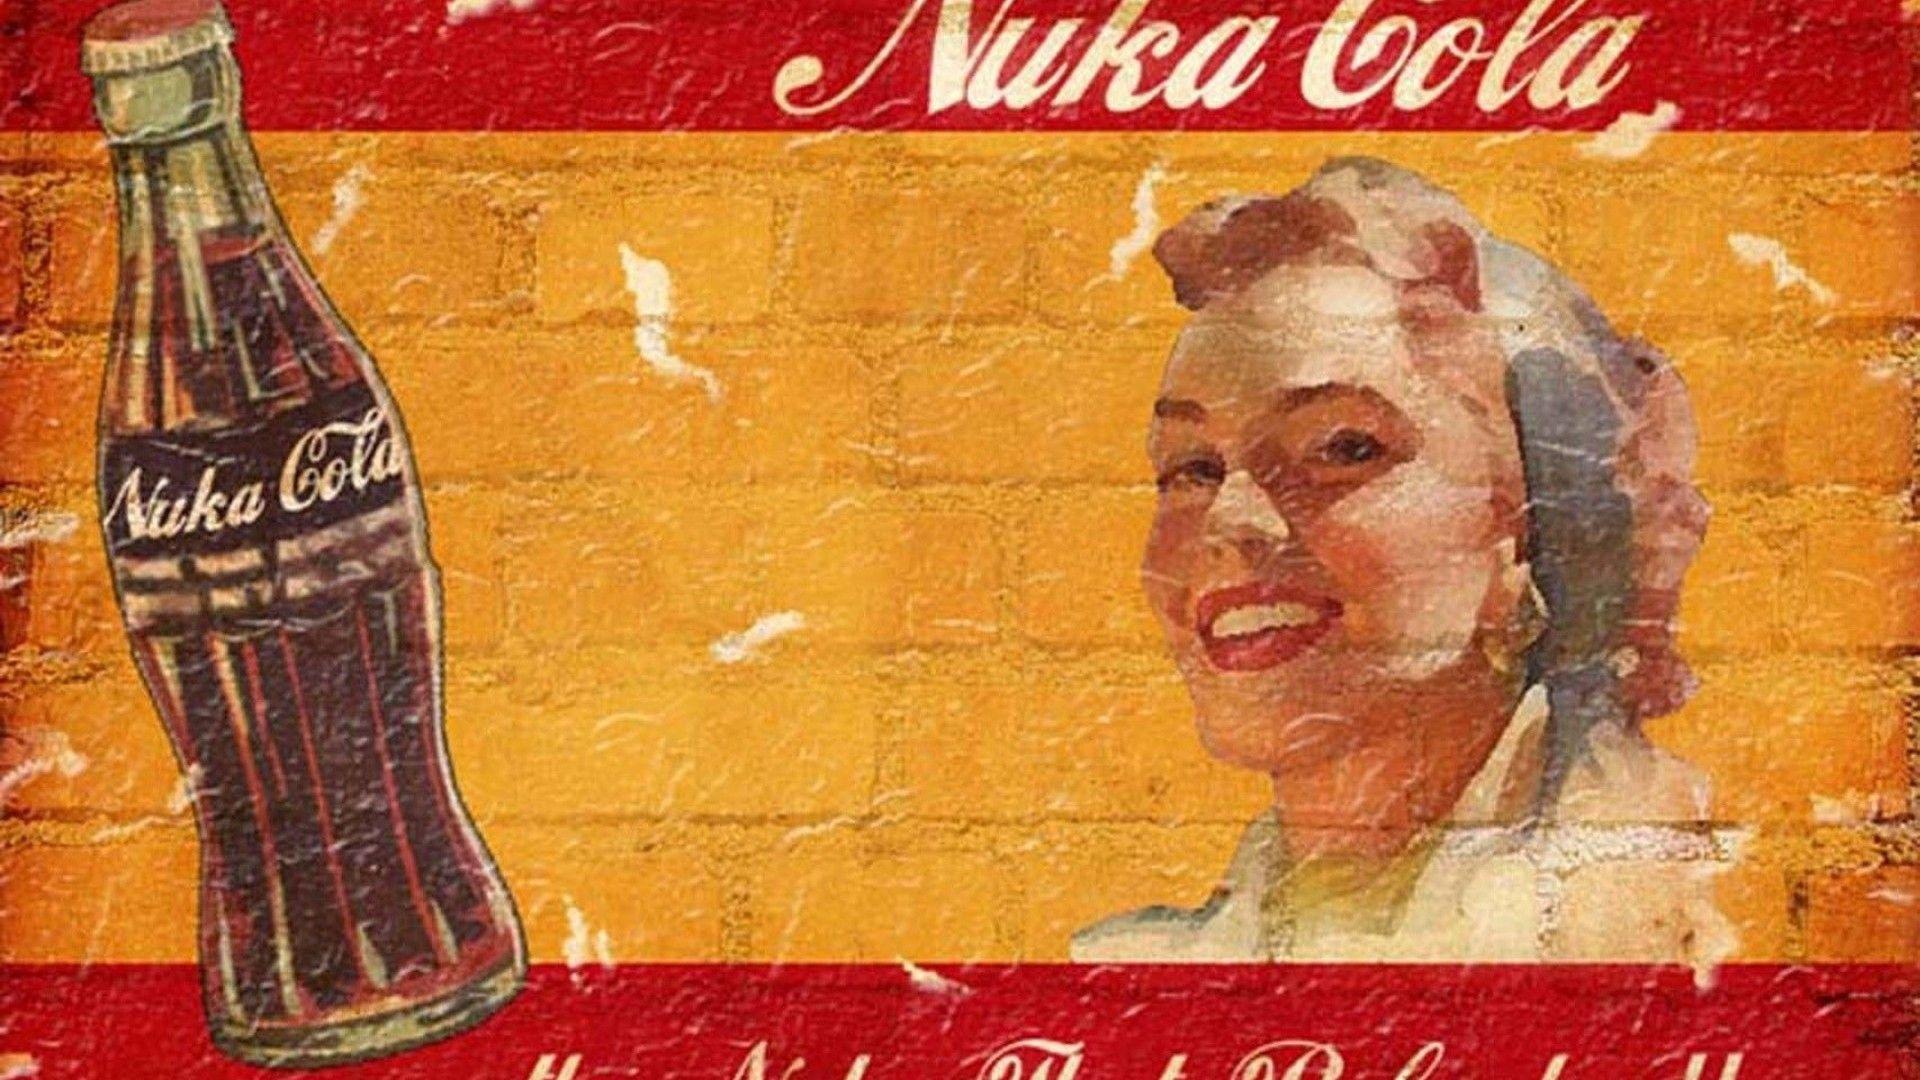 nuka world wallpaper 95394 trendnet